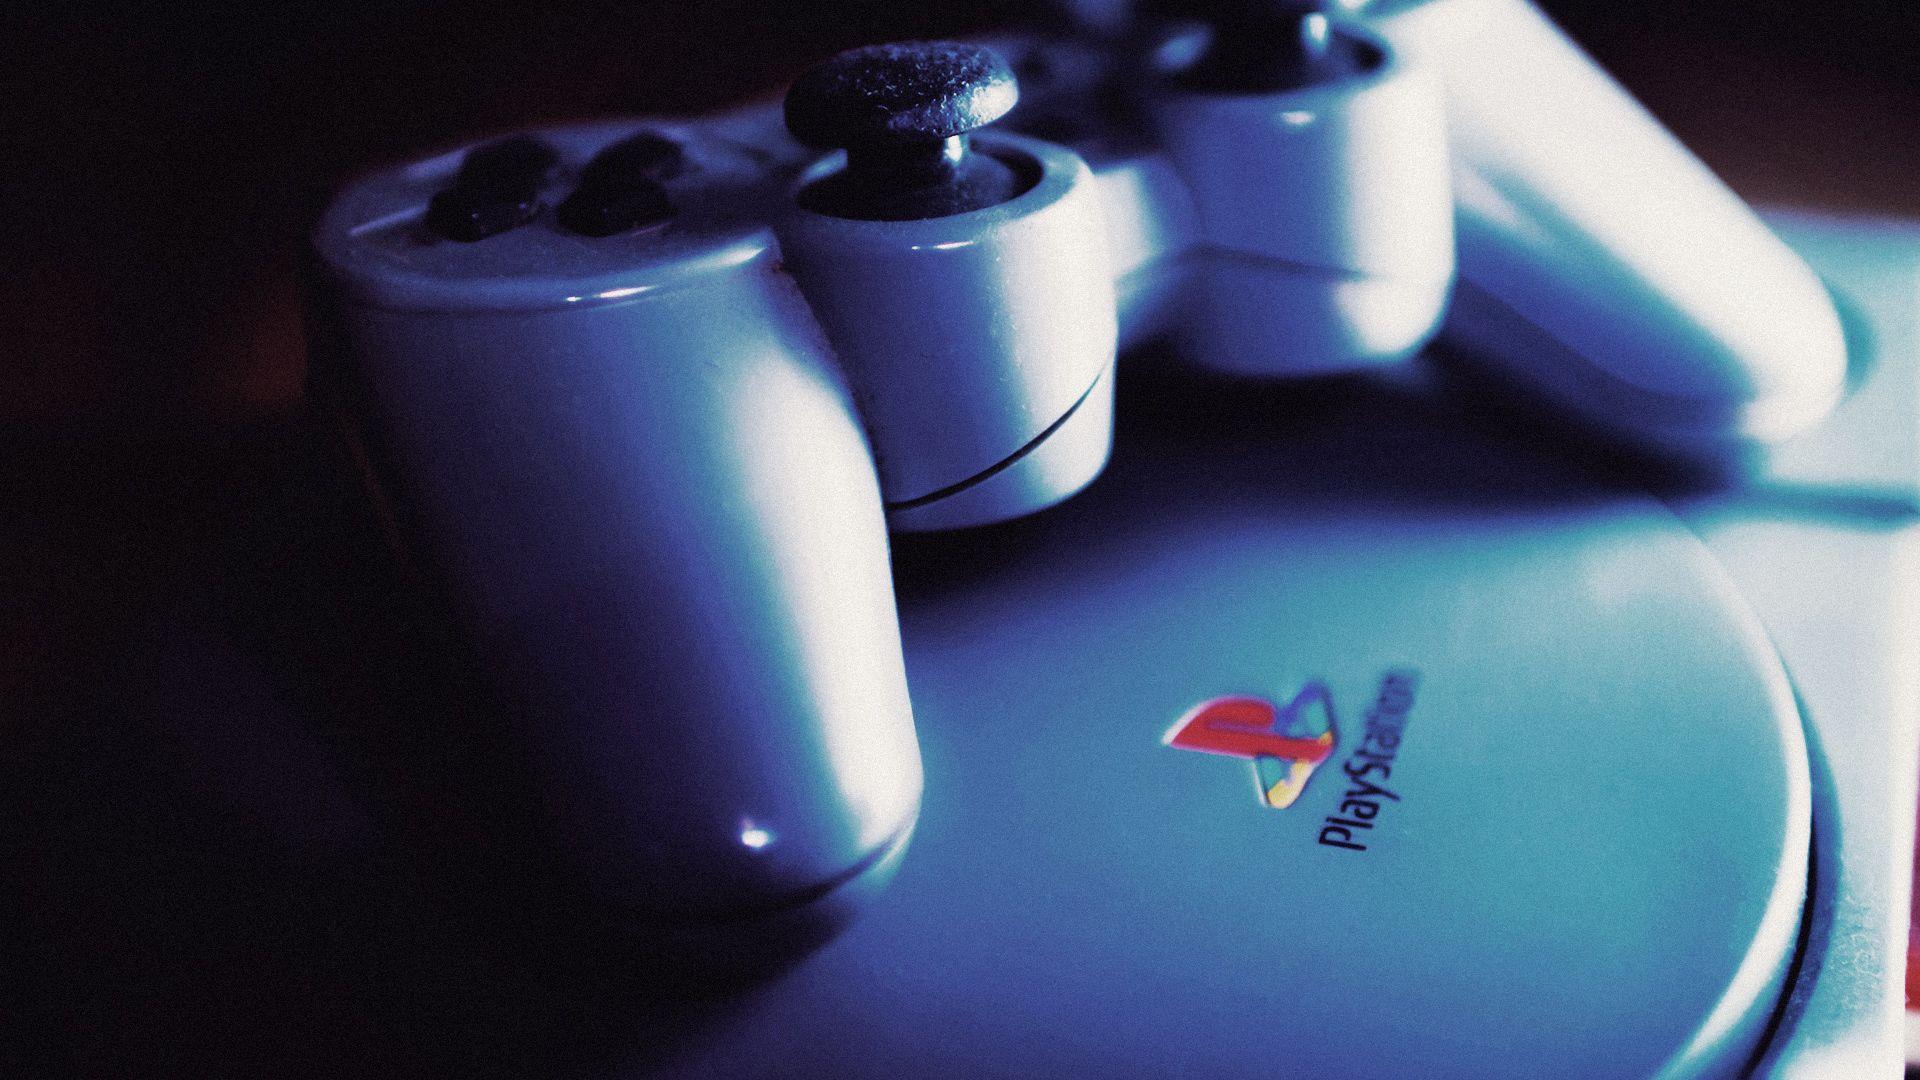 PlayStation 1 Wallpapers - Top Free PlayStation 1